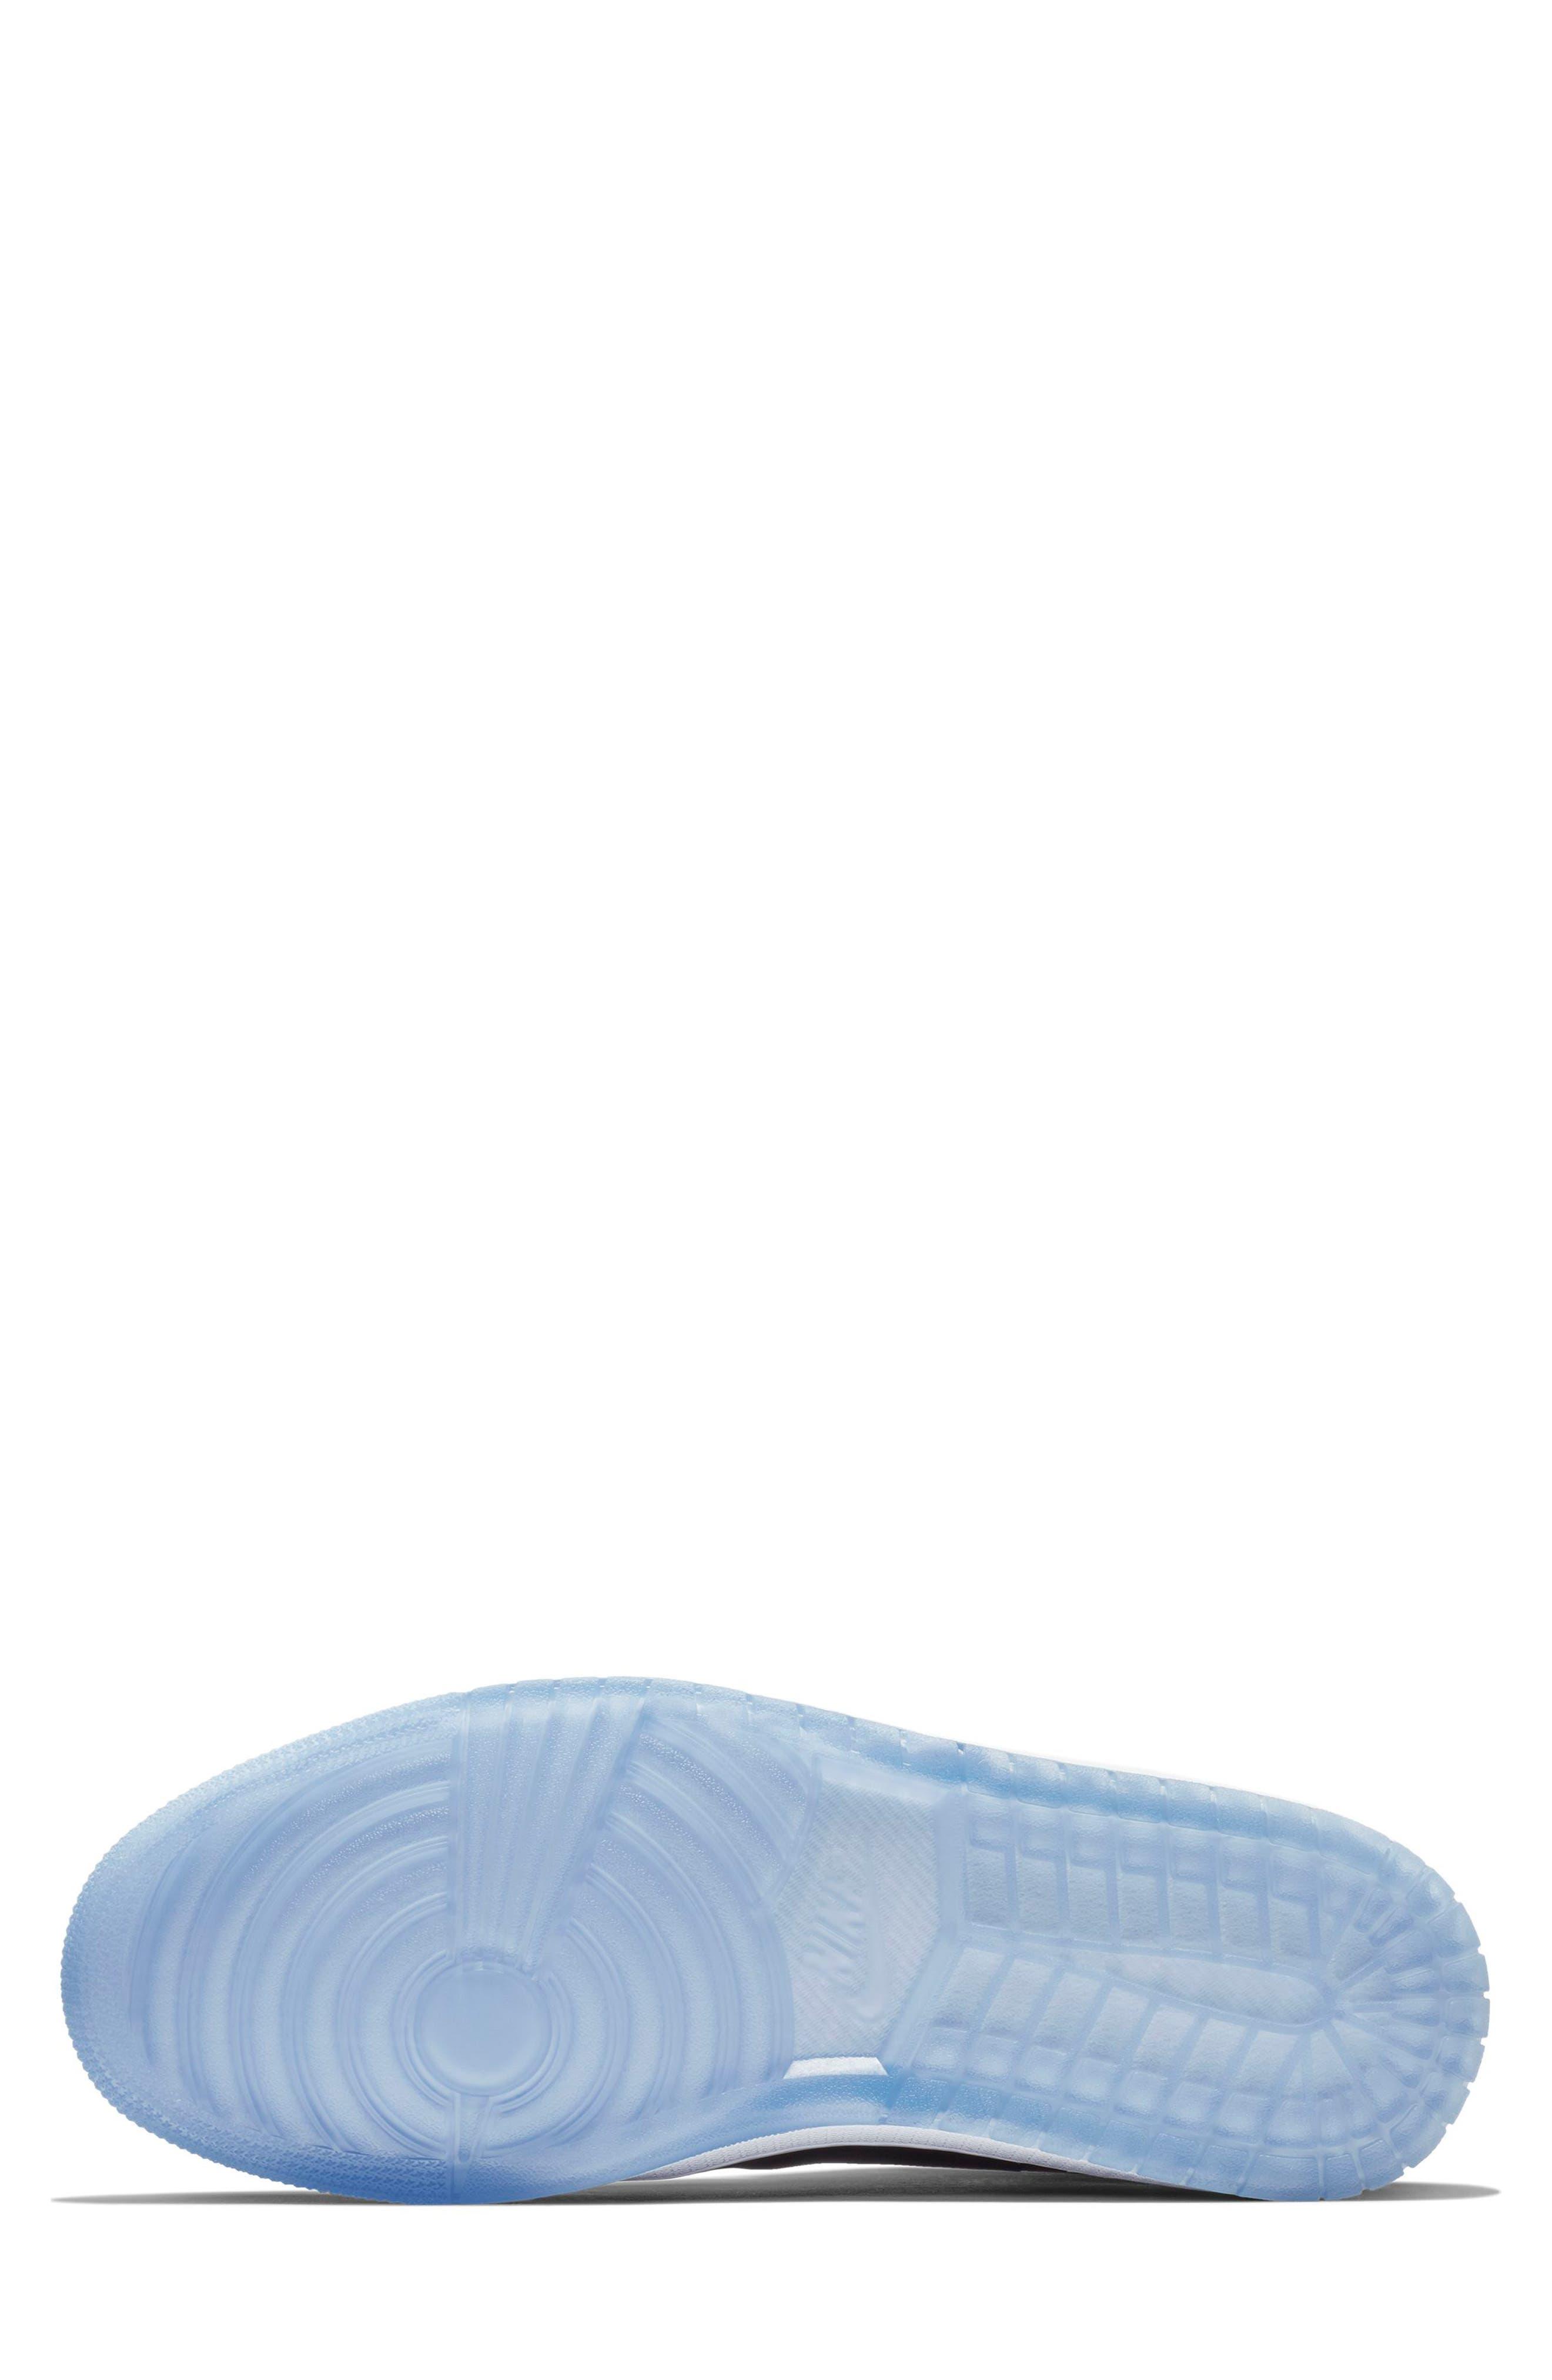 NIKE, Air Jordan 1 Retro High Double Strap Sneaker, Alternate thumbnail 4, color, WHITE/ DARK CONCORD/ BLACK